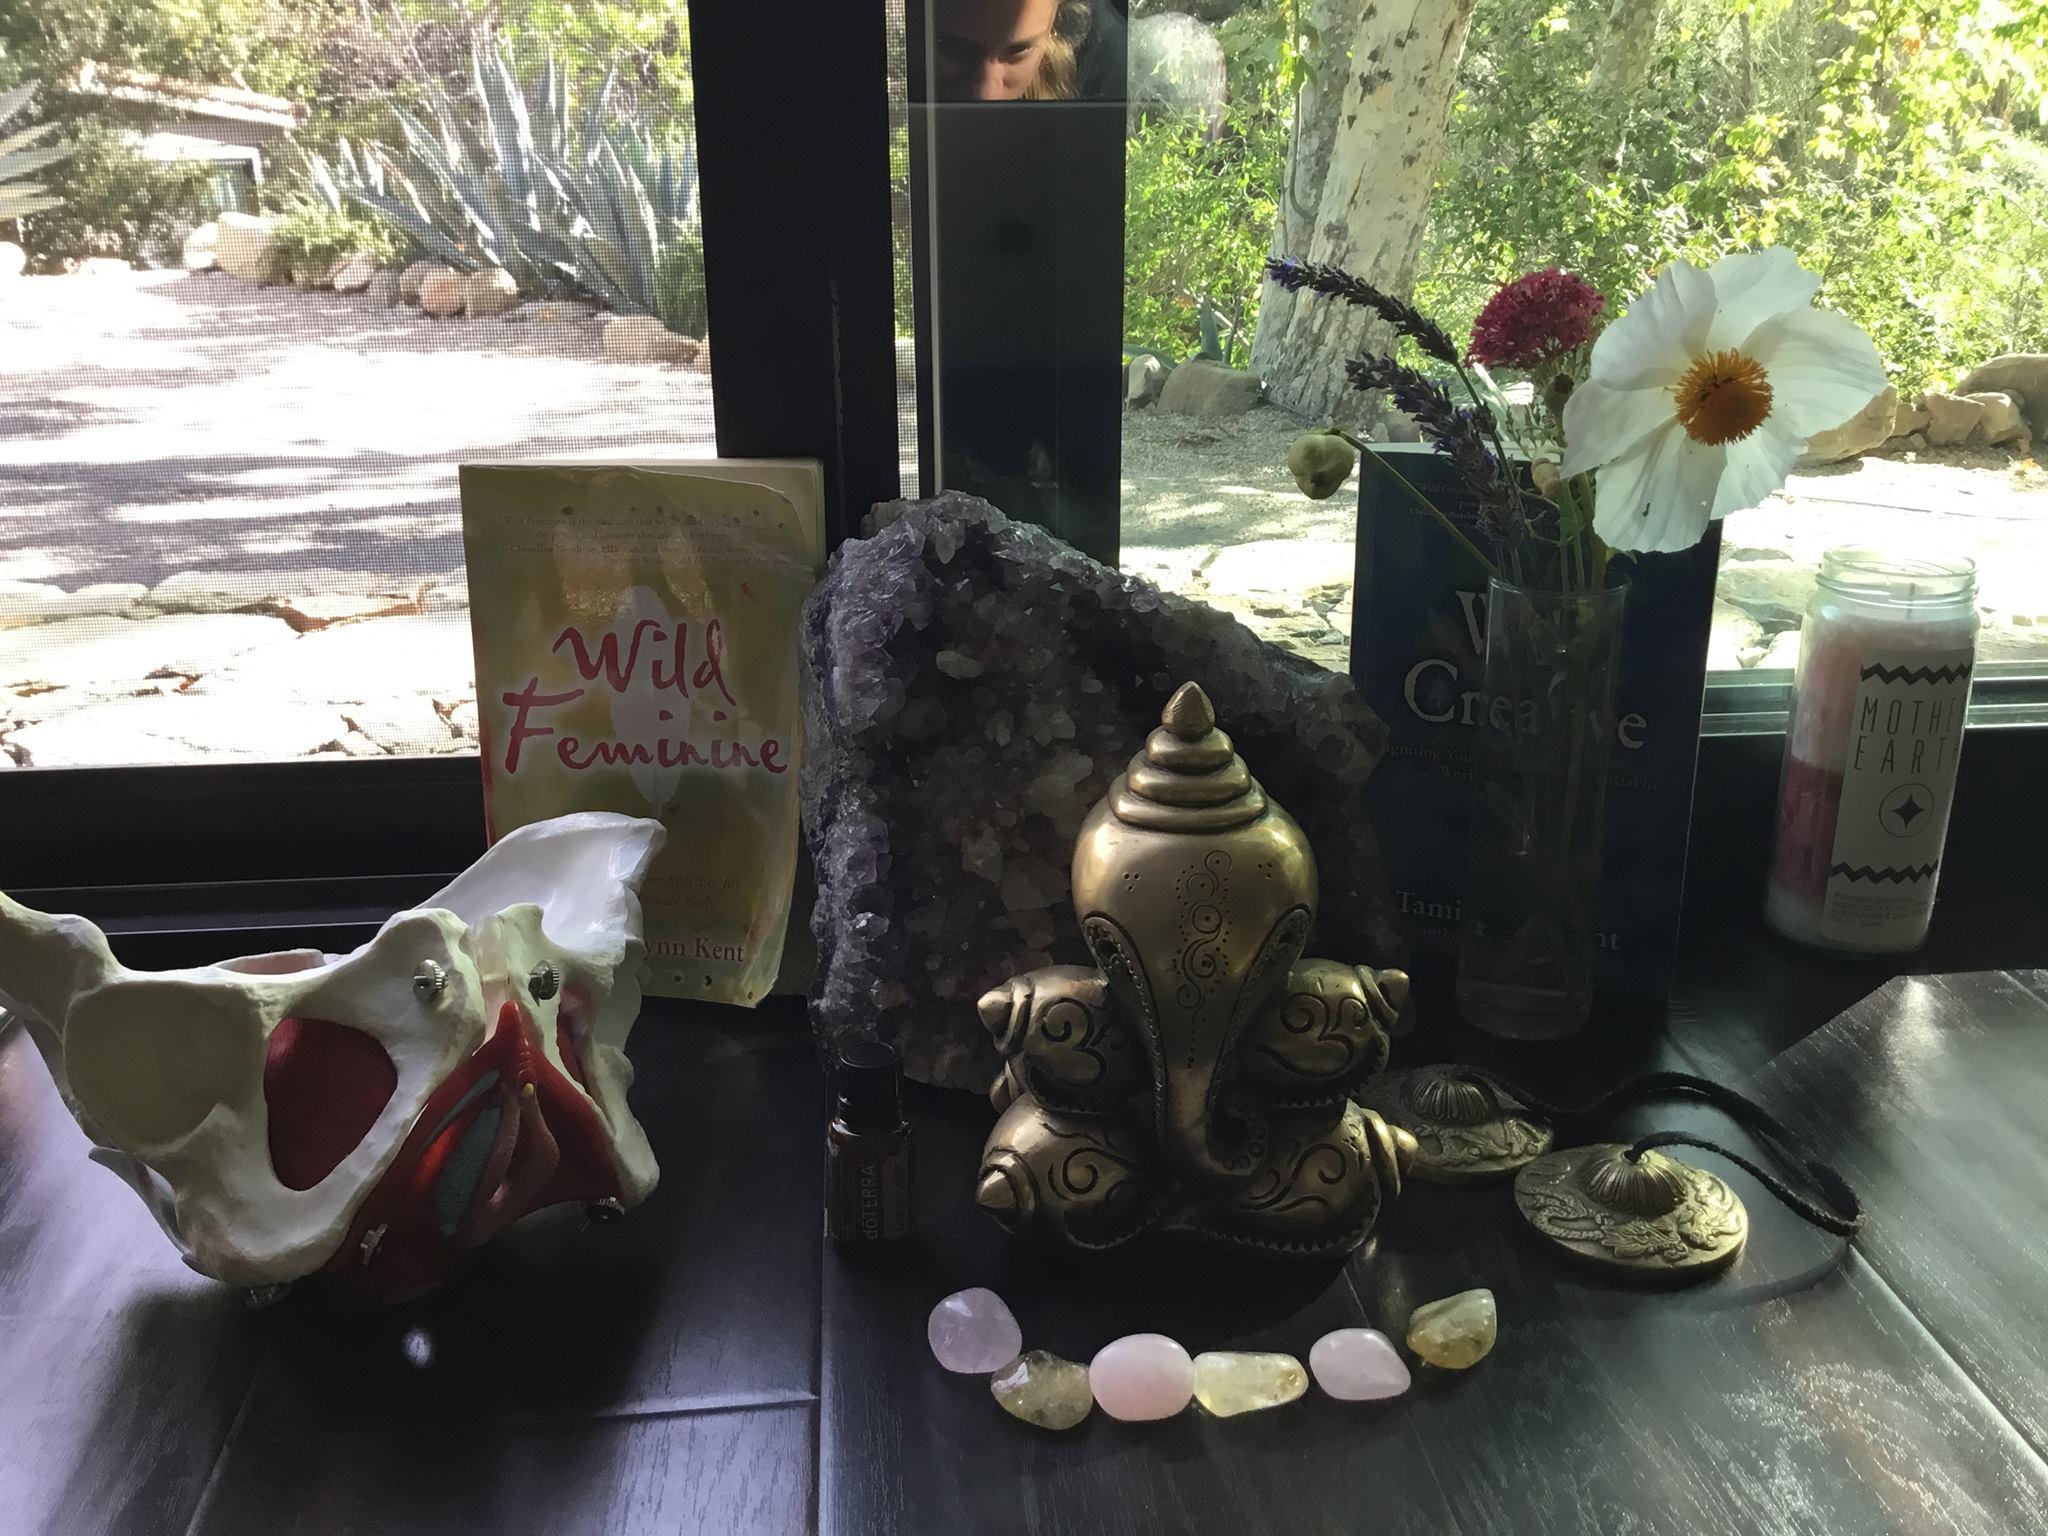 Copy of wild feminine, pelvis, healing